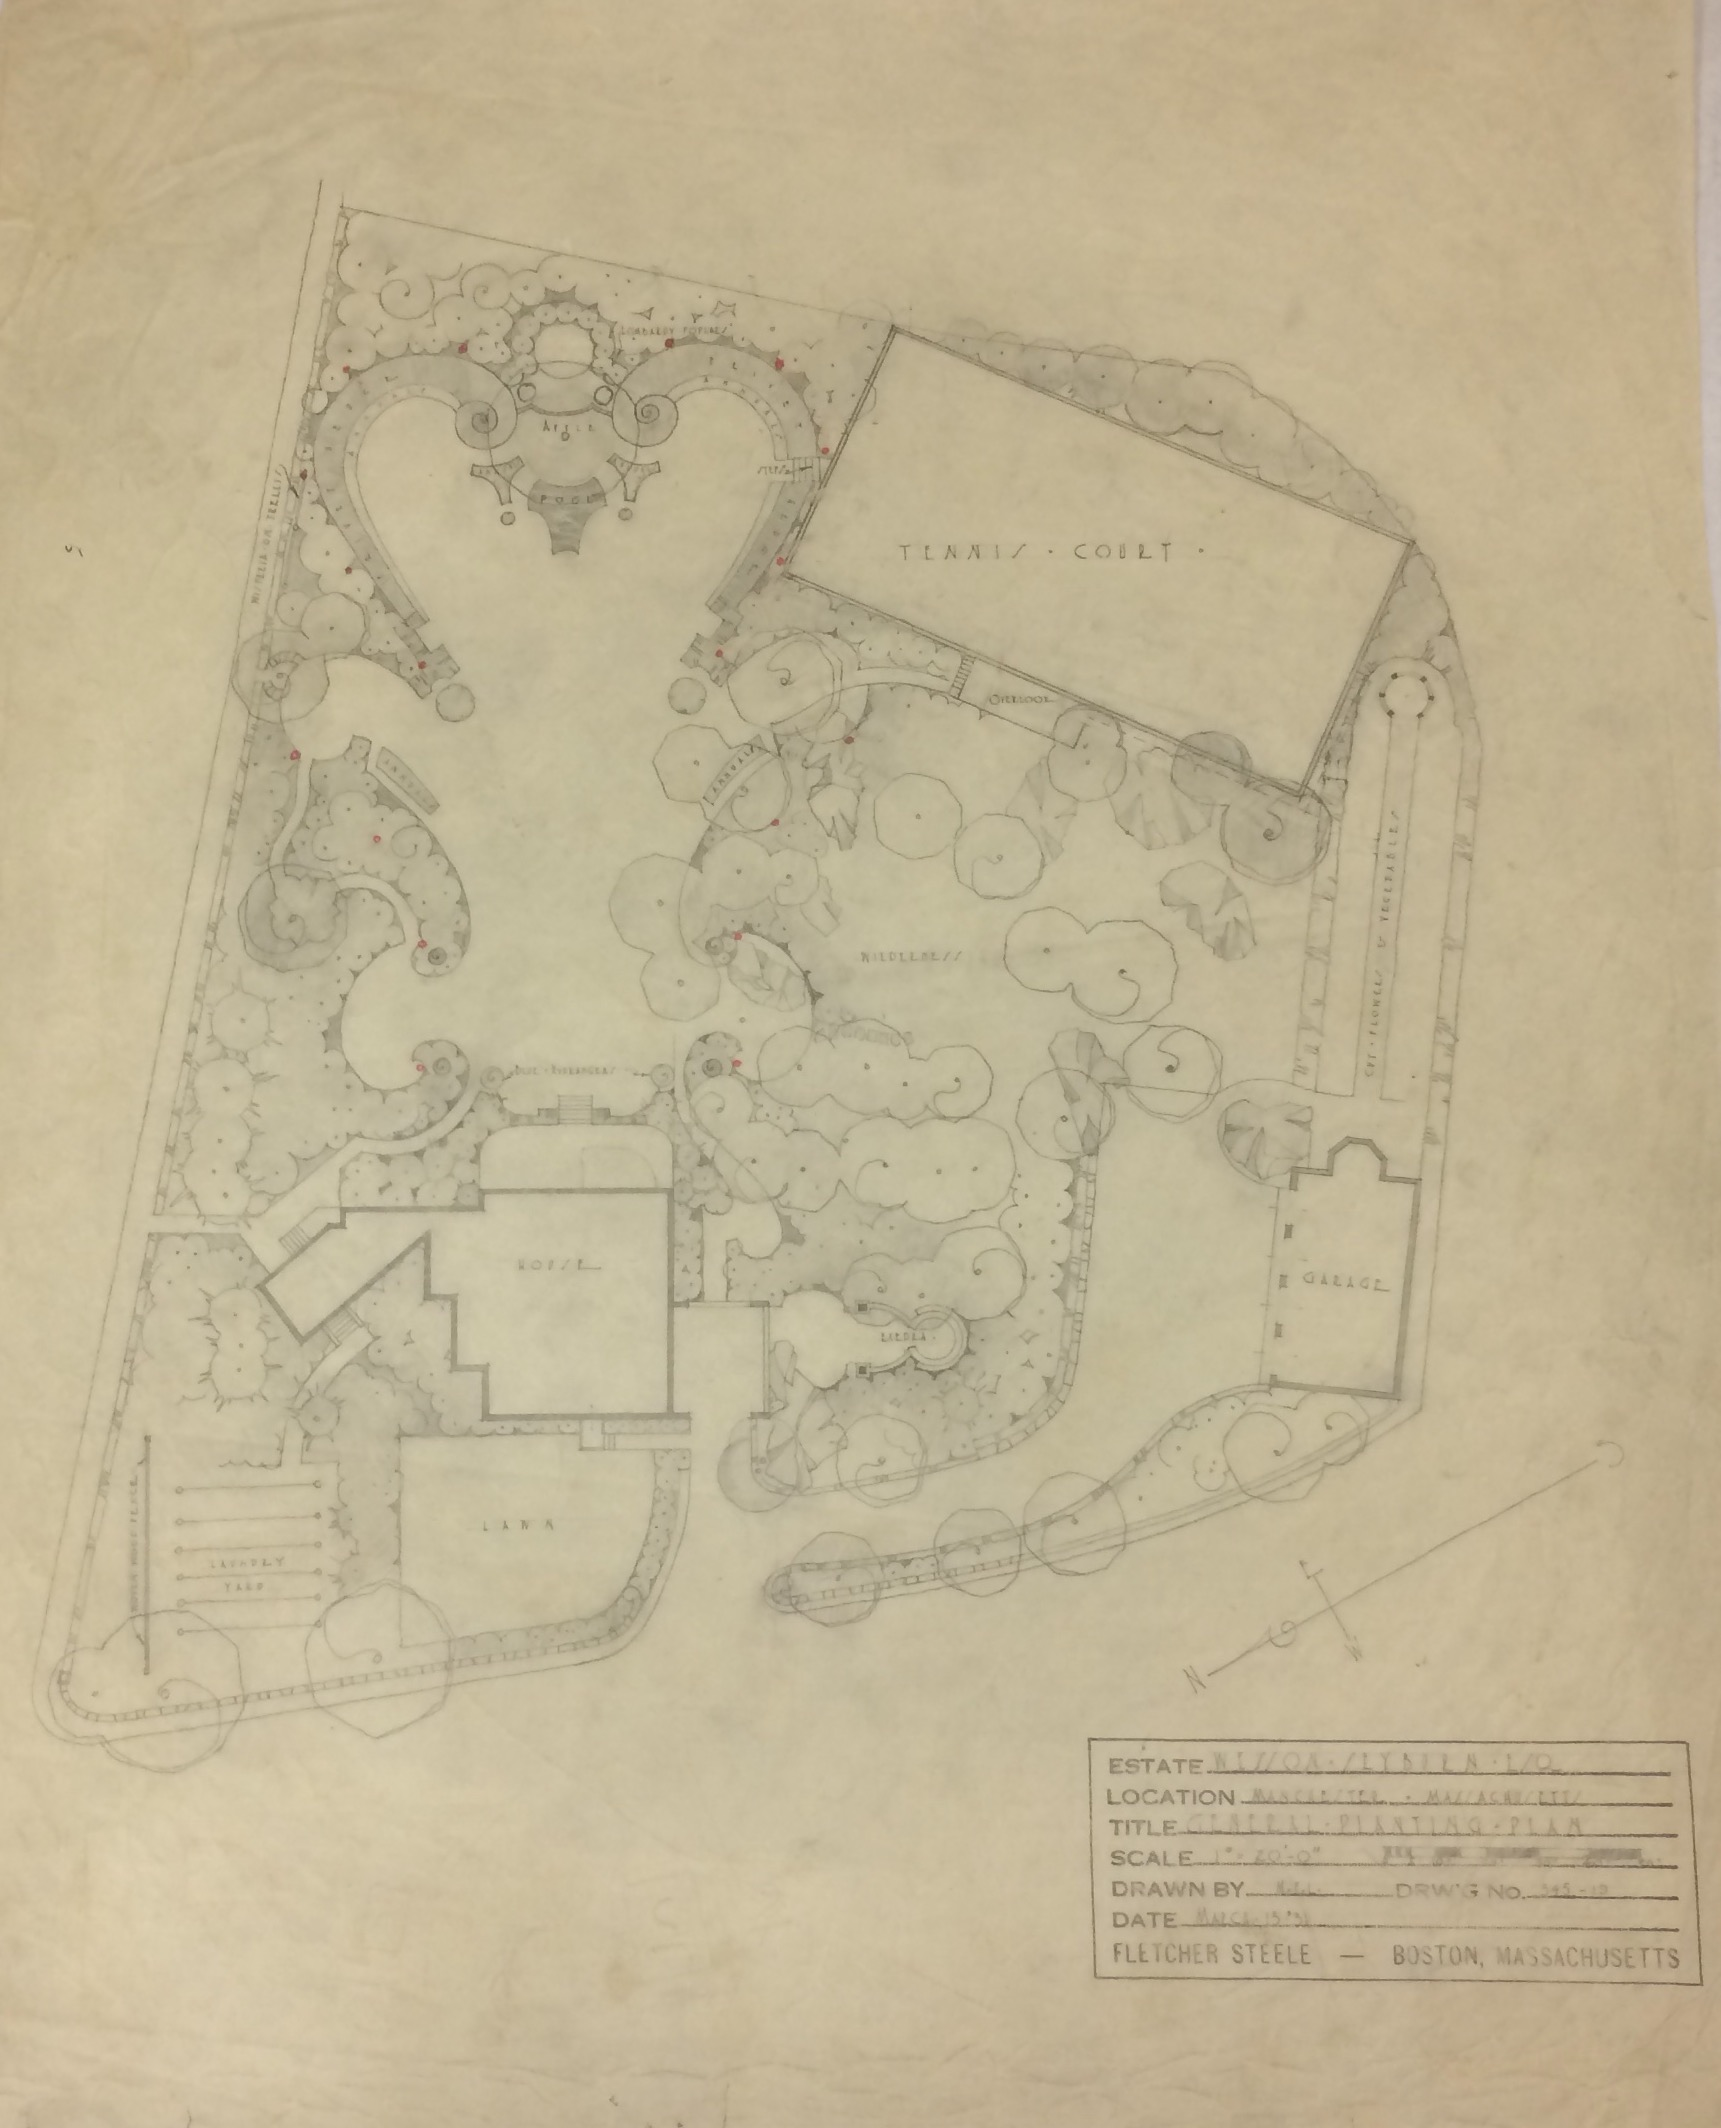 Fletcher Steele Landscape Architect Large Scale